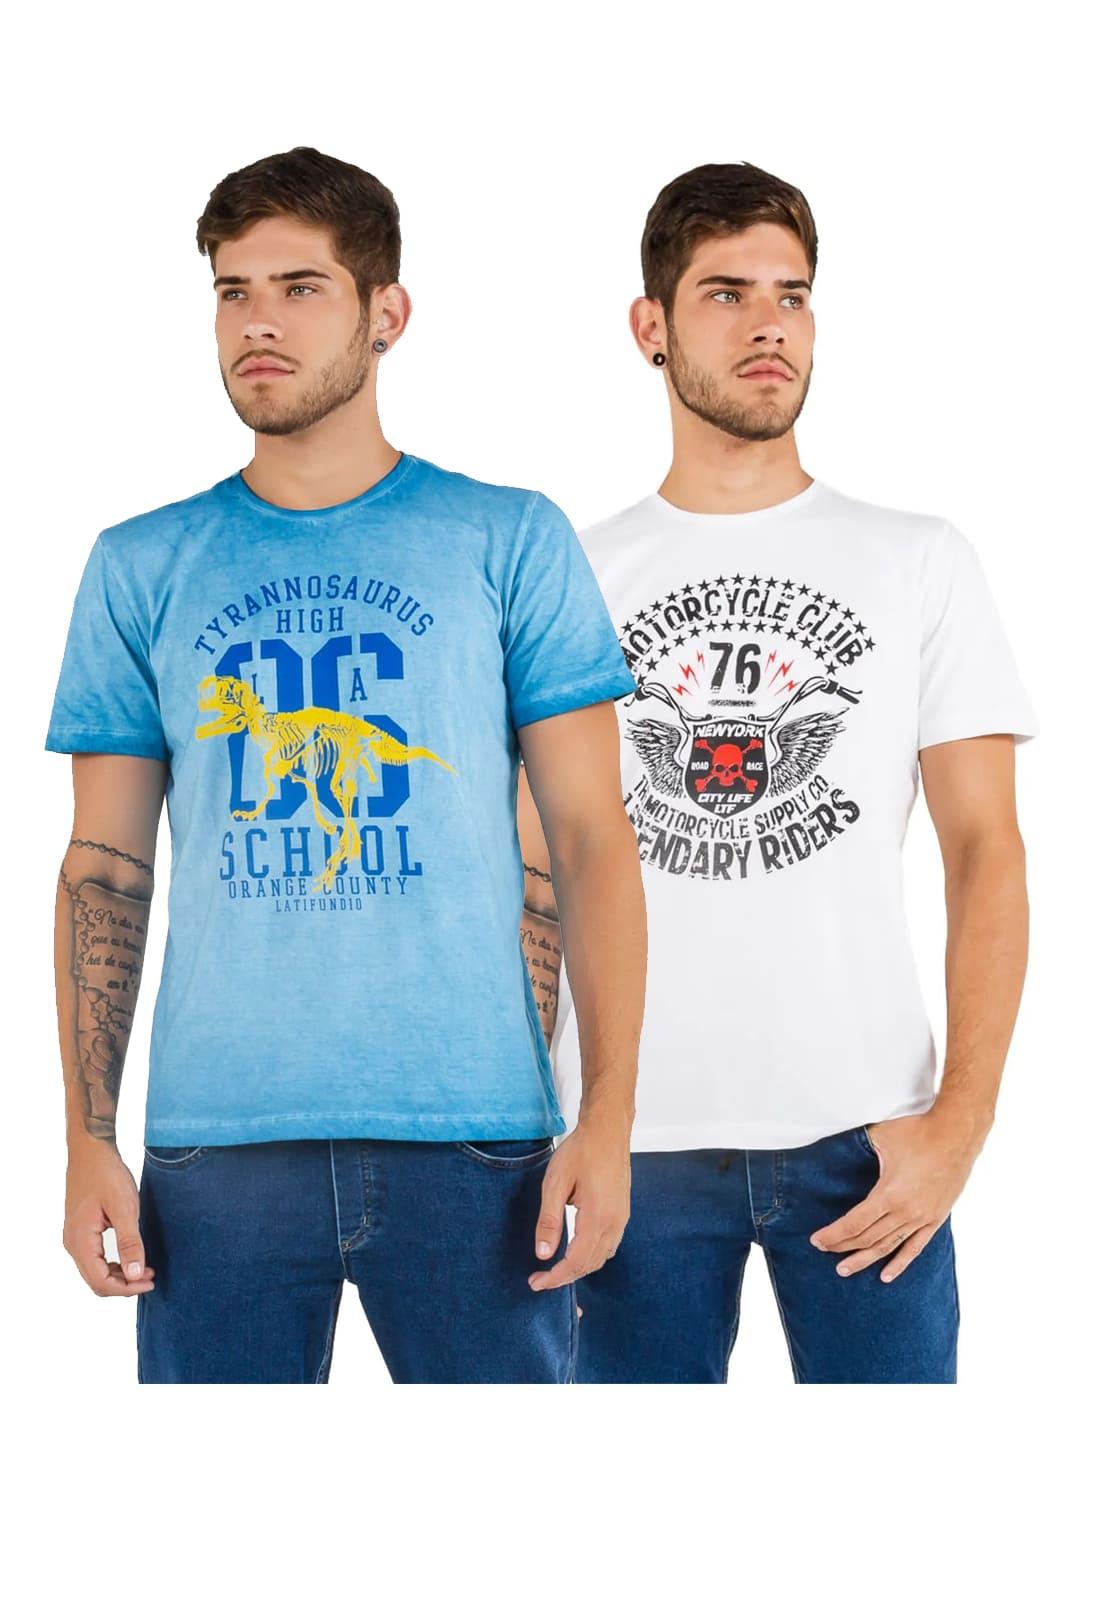 2 T-shirts Masculina - Estampa High School - Motorcycle Club